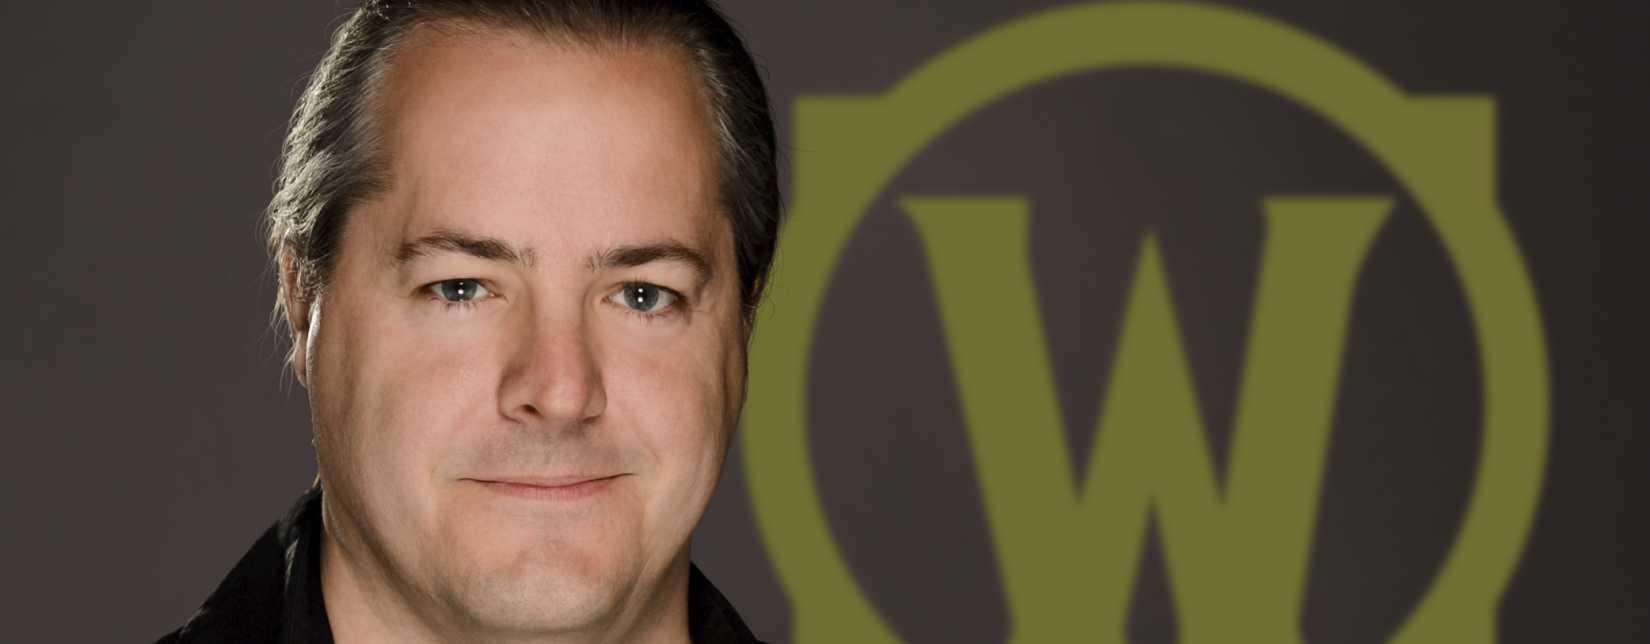 Blizzard-Chef reagiert persönlich auf Hongkong-Affäre, verringert Strafe für Blitzchung